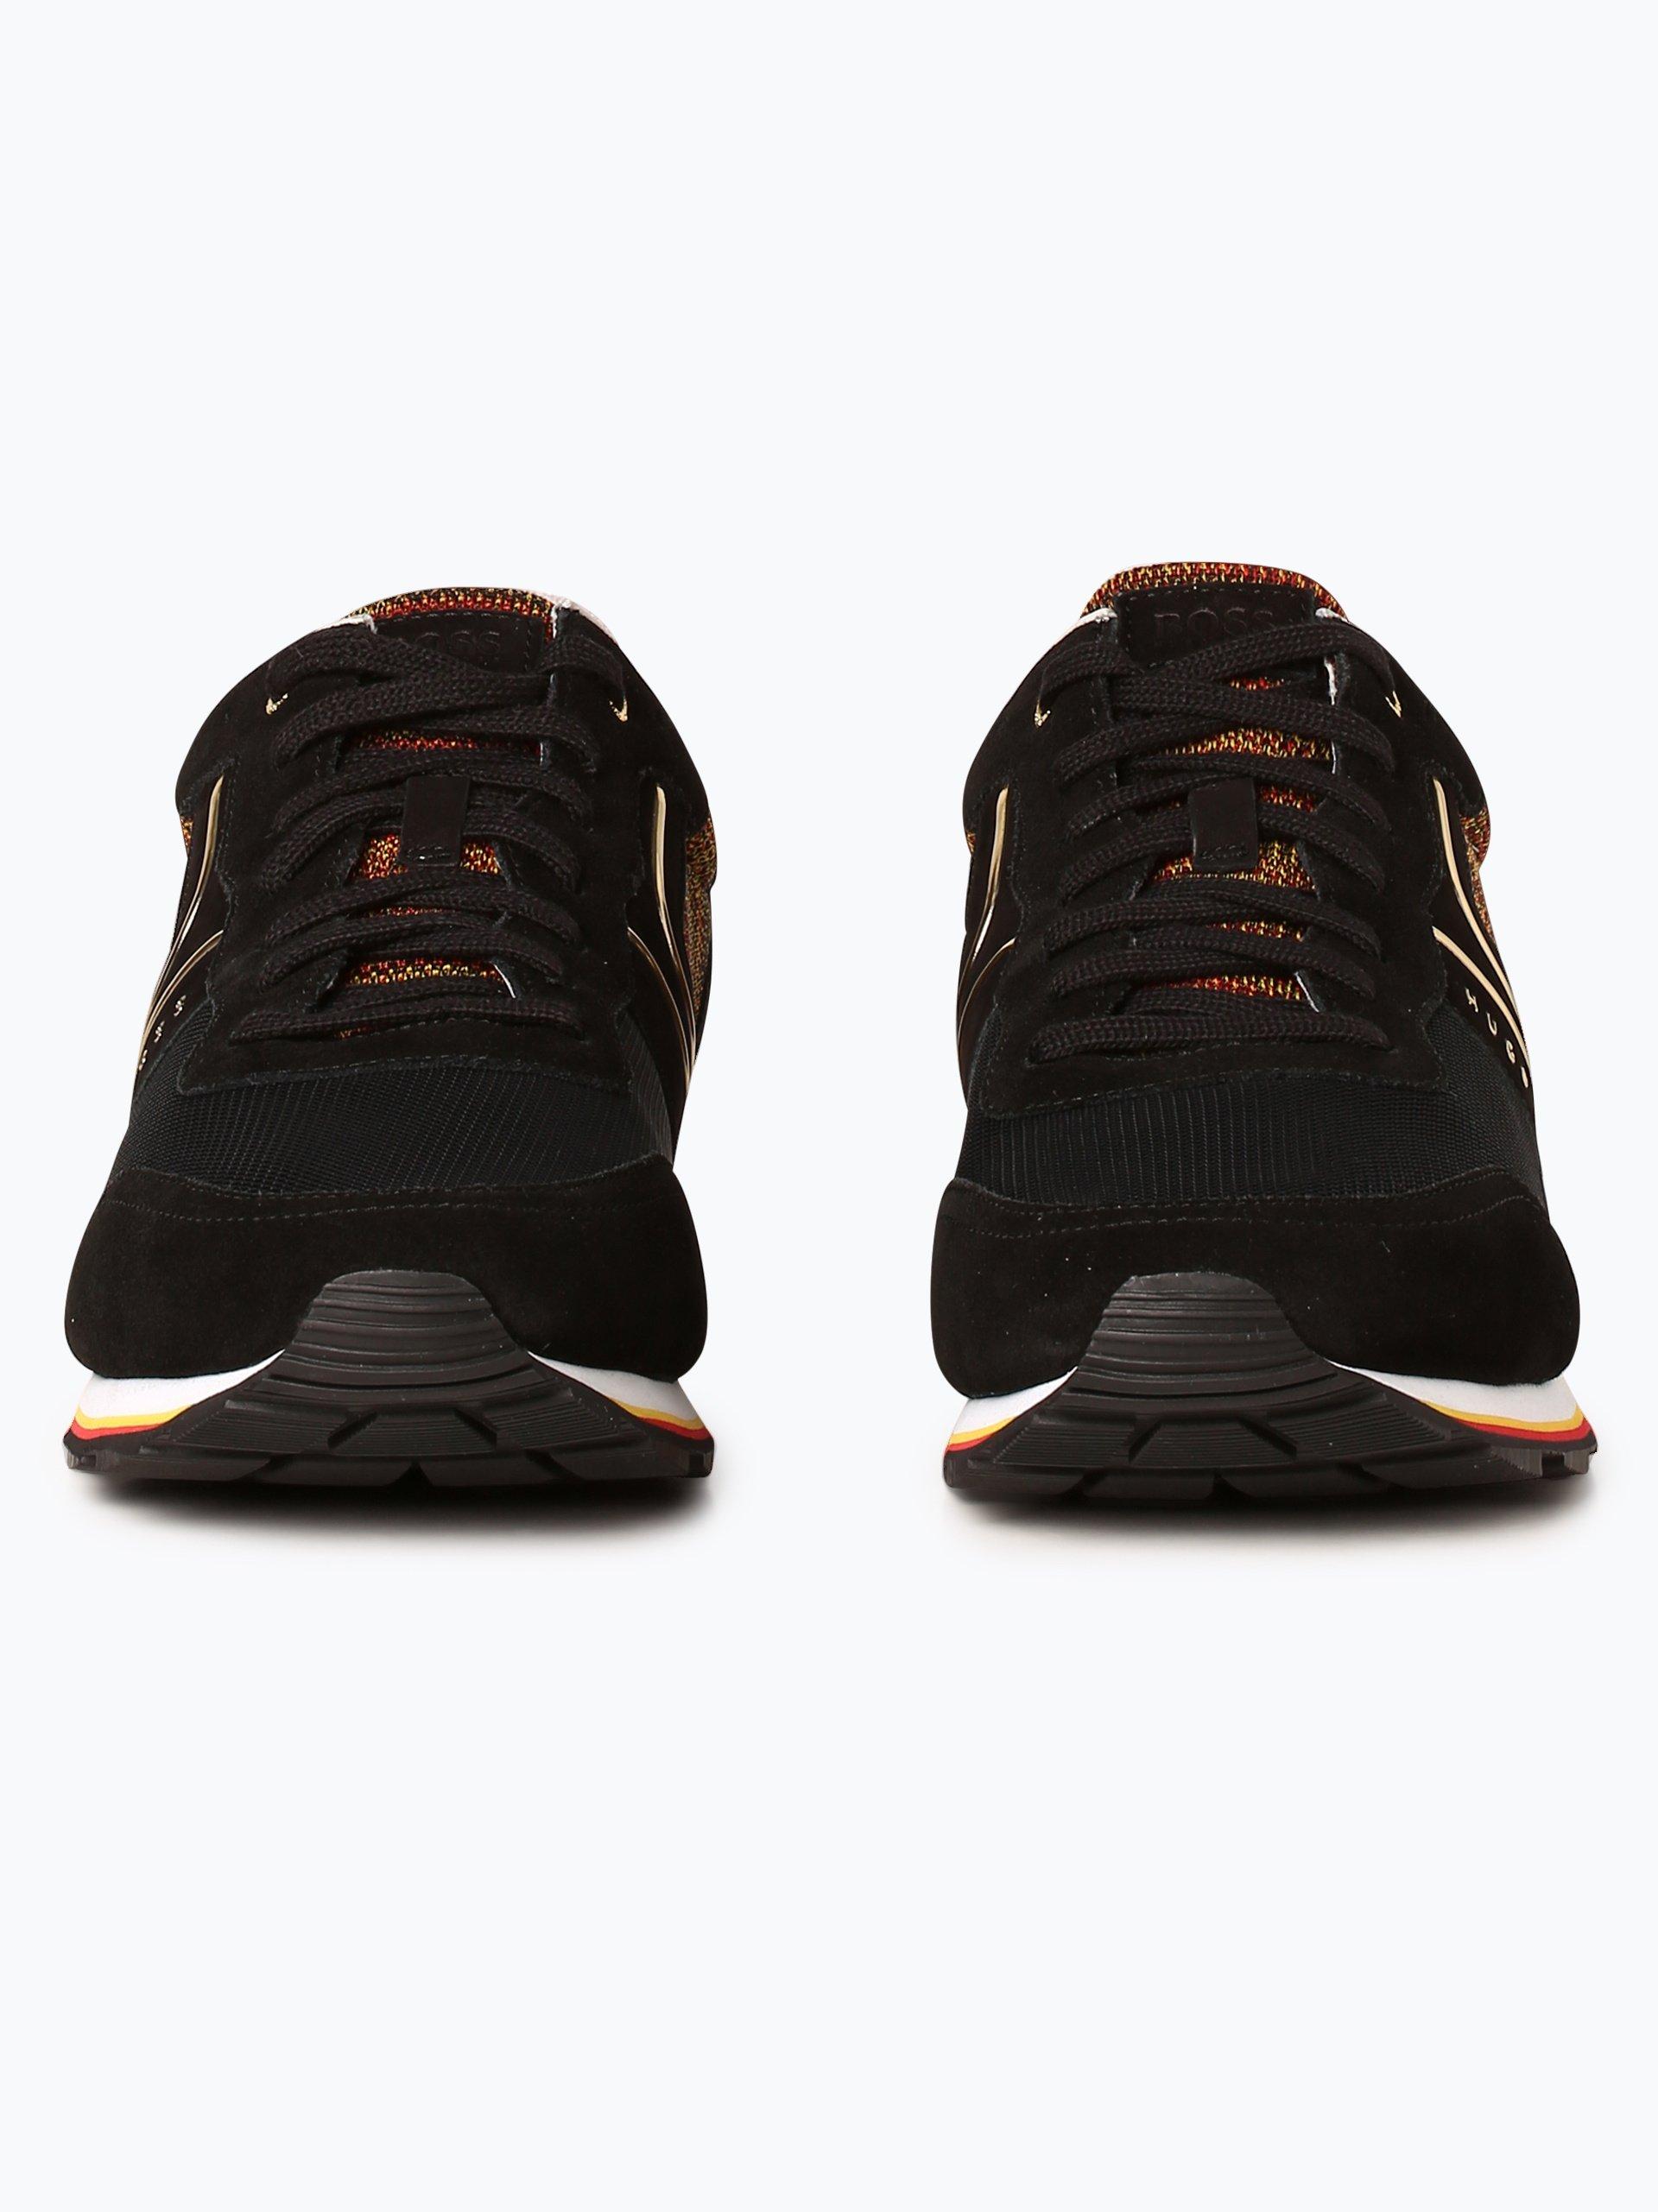 BOSS Menswear Athleisure Herren Sneaker mit Leder-Anteil - Parkour_Runn_flag